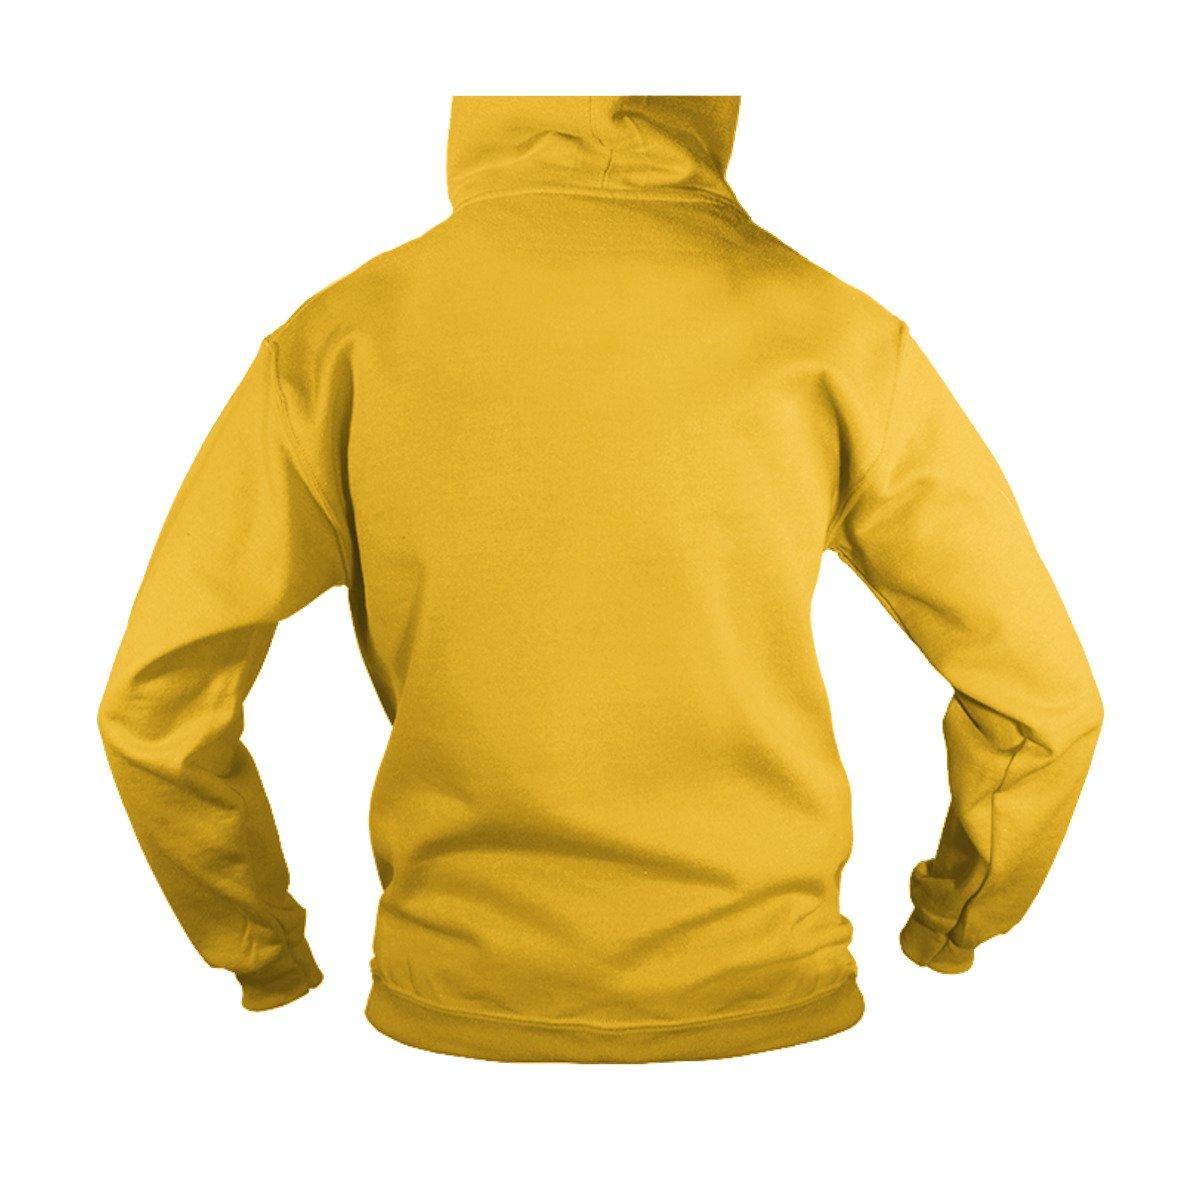 Sleeky Pikachu Deadpool T-Shirt